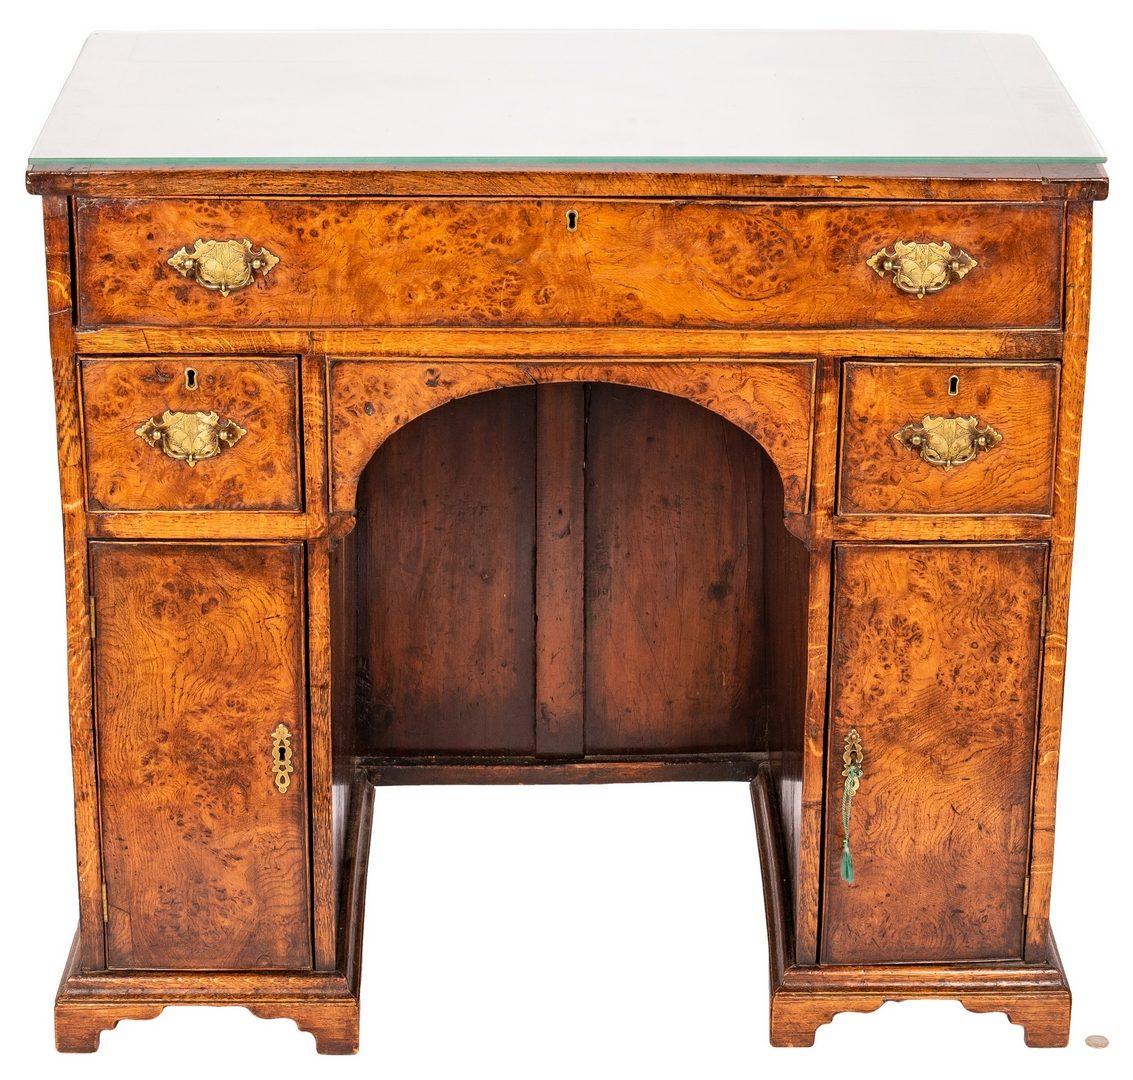 Lot 81: Queen Anne Style Burlwood Desk